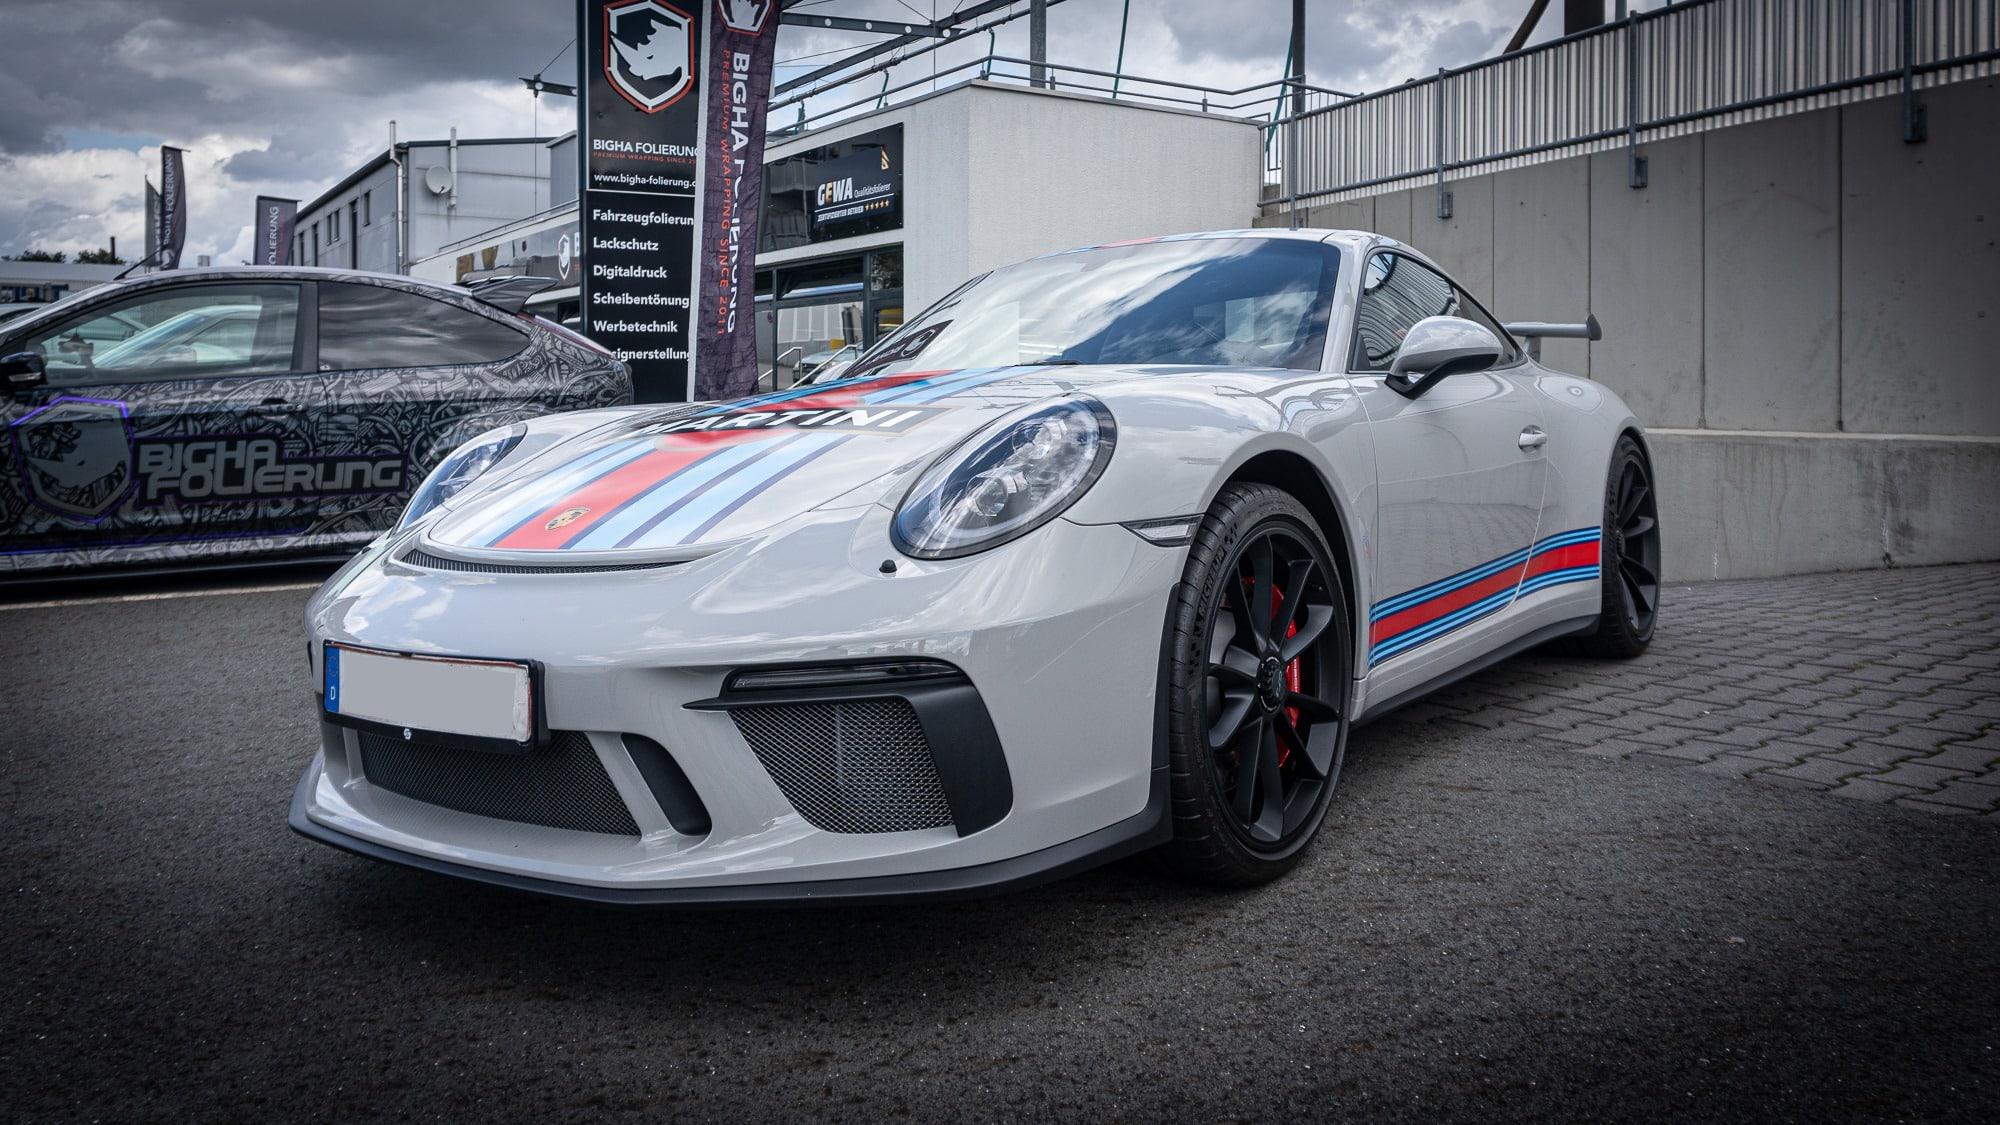 Porsche GT3 991 911 Martini Design